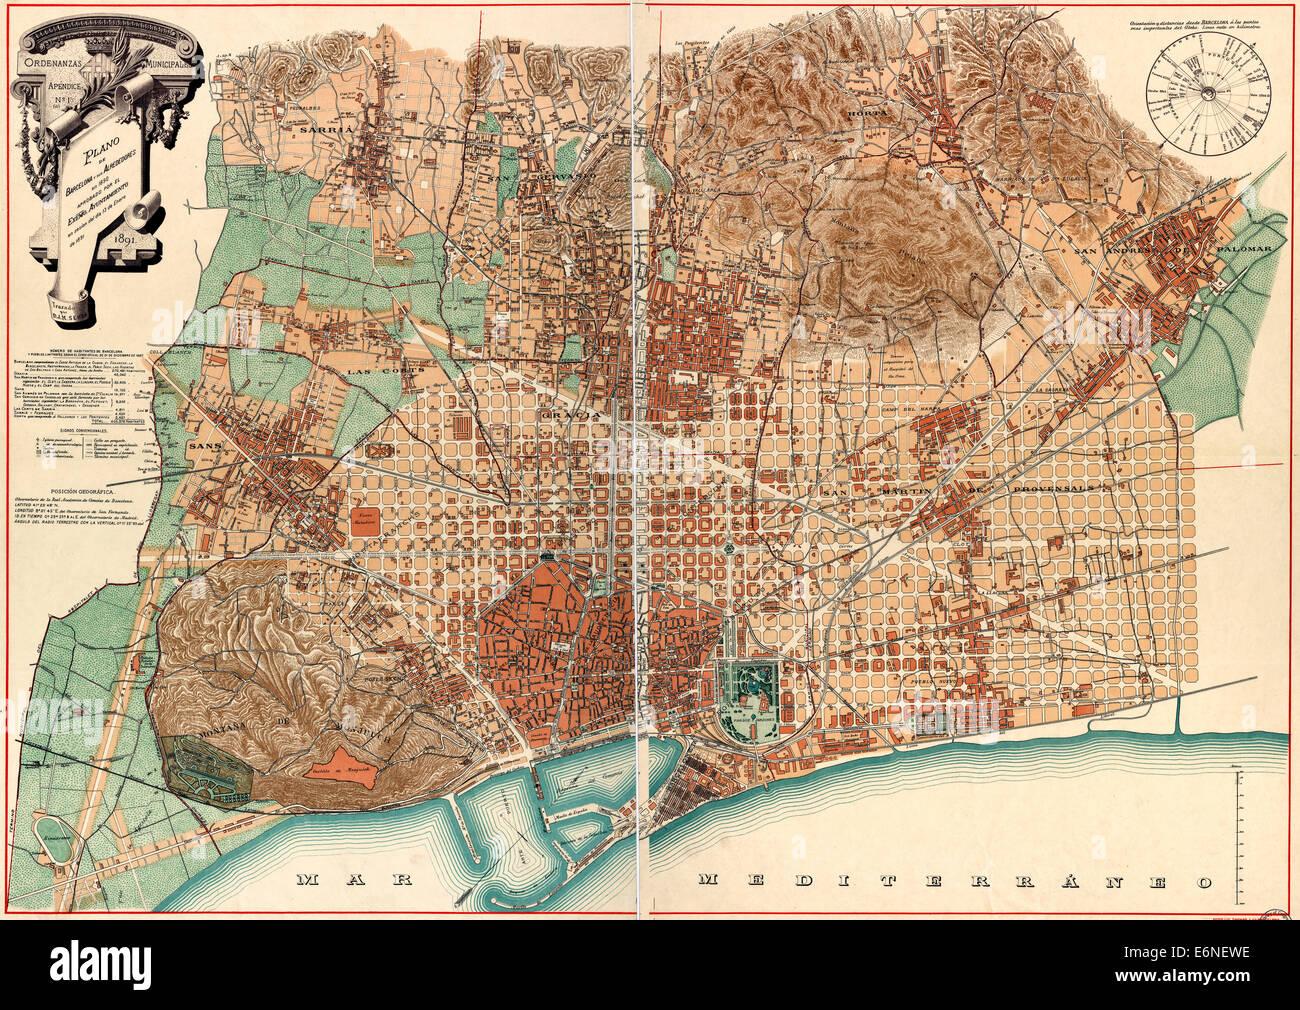 Map of barcelona spain circa 1890 stock photo royalty - Mobles vintage barcelona ...